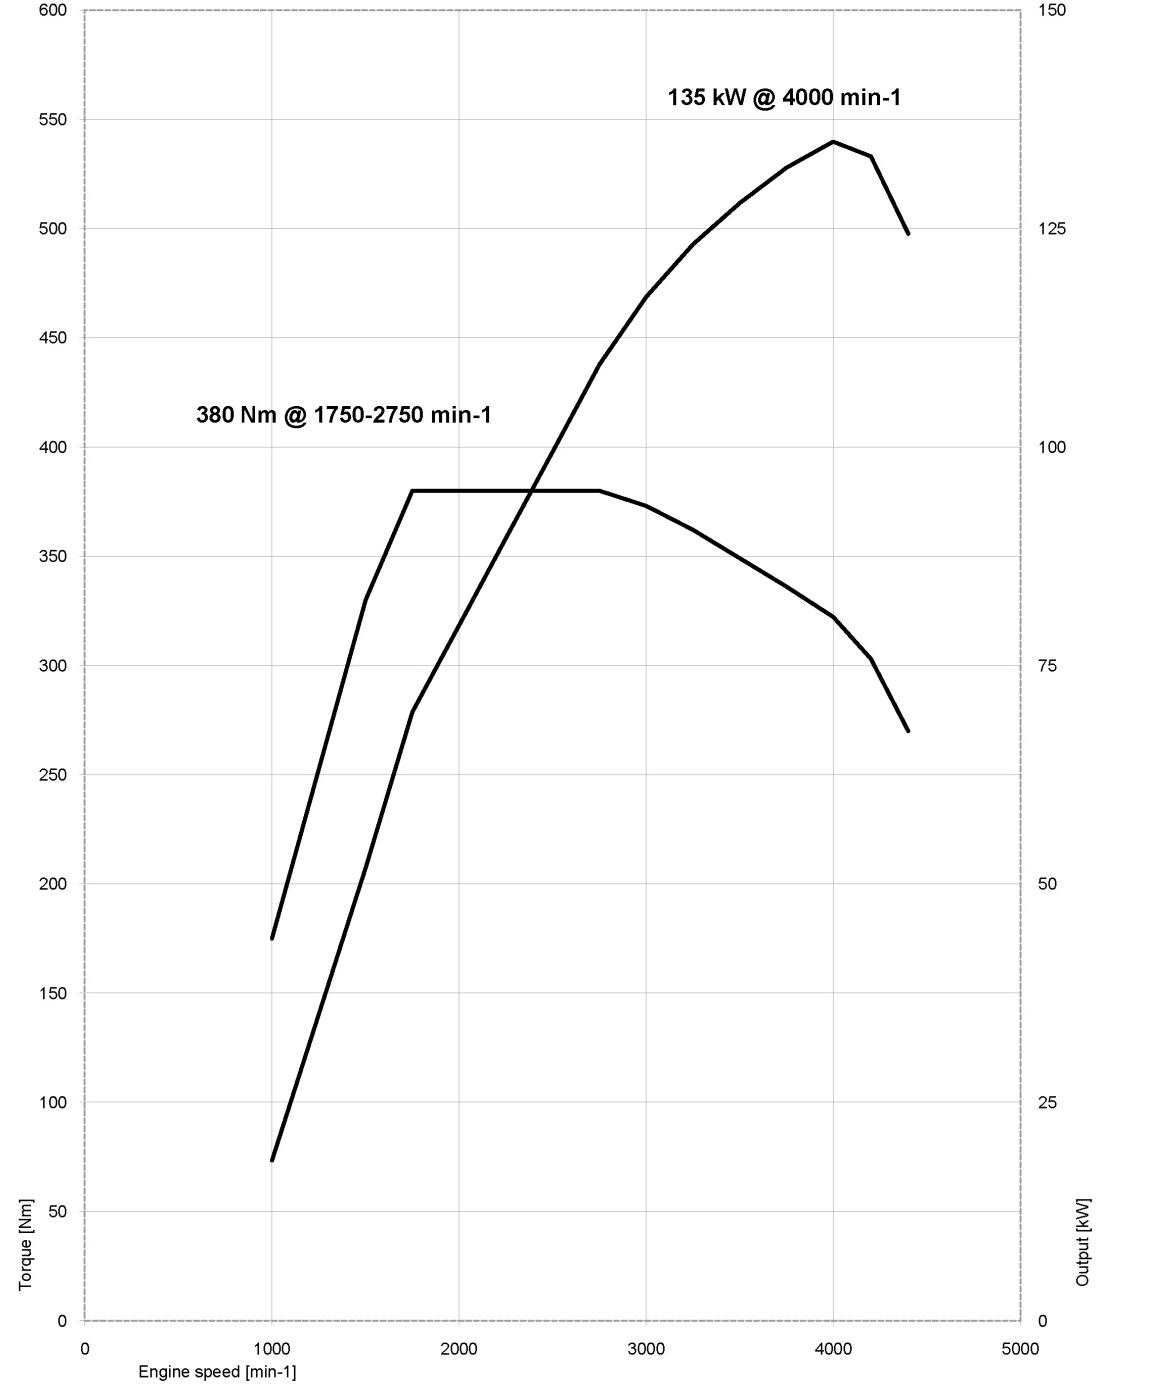 Bmw 3 0 Engine Diagram